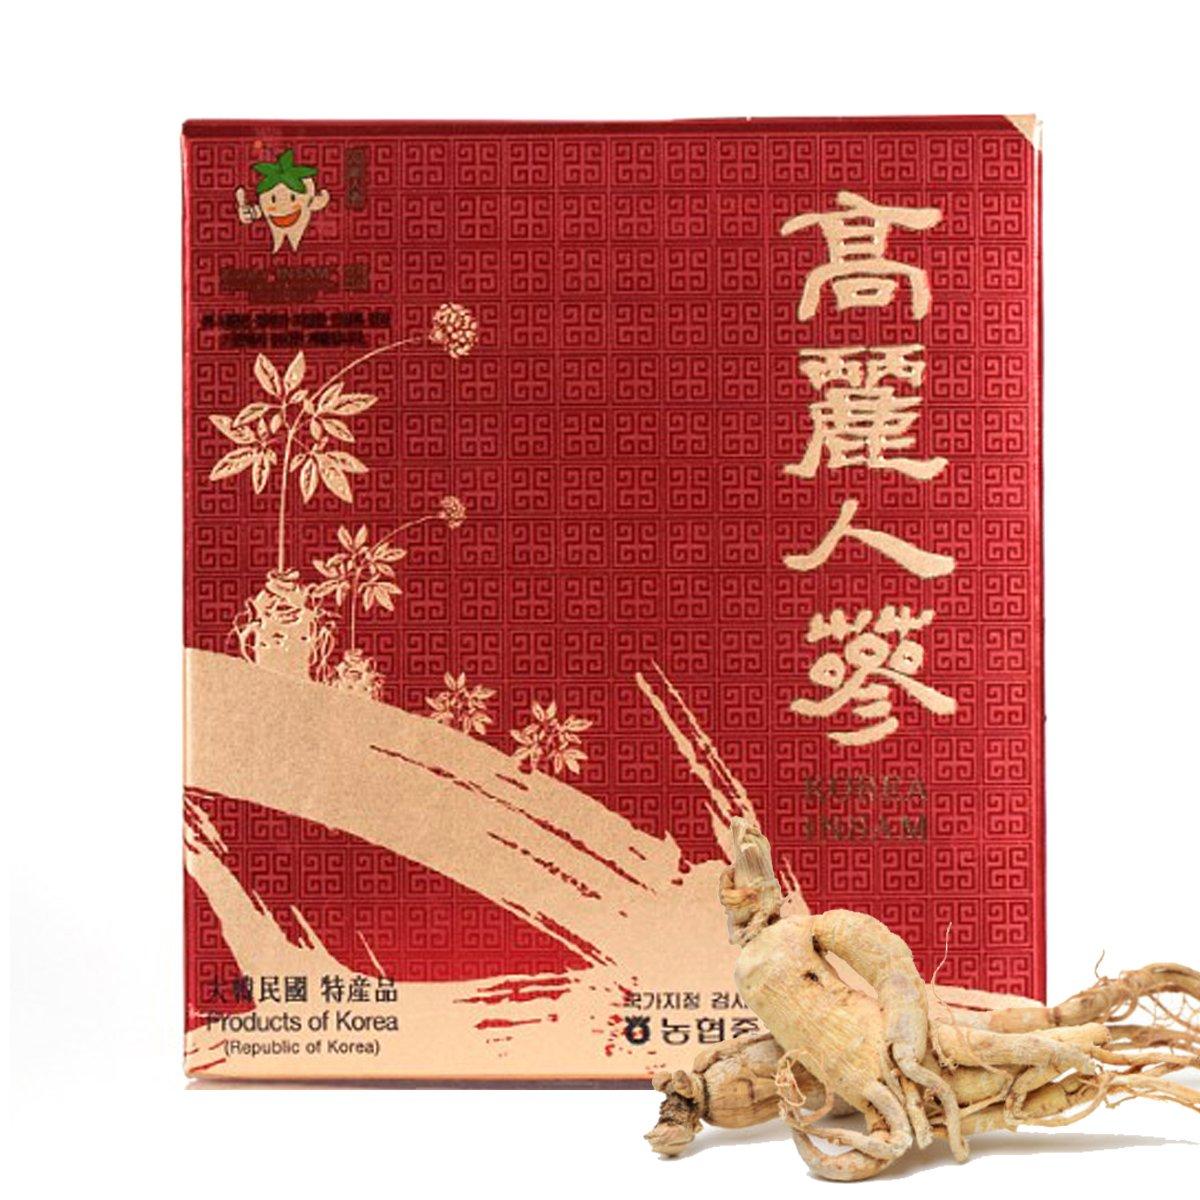 [Medicinal Korean Herb] Premium Korean Koryeo Ginseng 4 Years Old (Renshen/고려 인삼) Dried Bulk Herbs 300g (50 Roots) by HERBstory (Image #1)